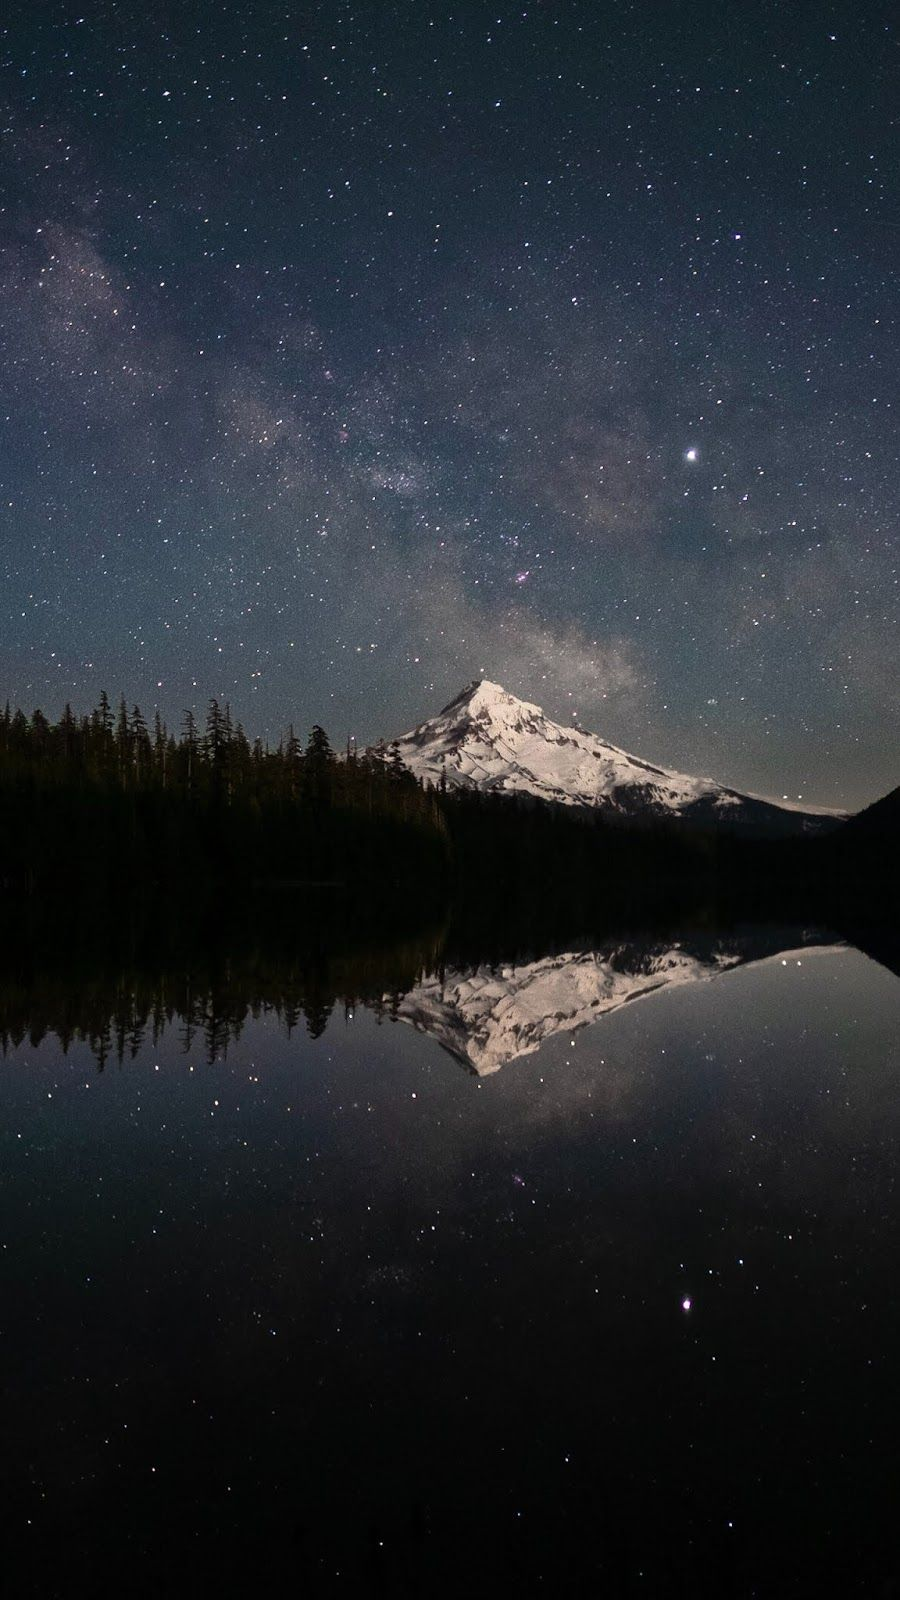 Snowy mountain in starry night Starry night wallpaper